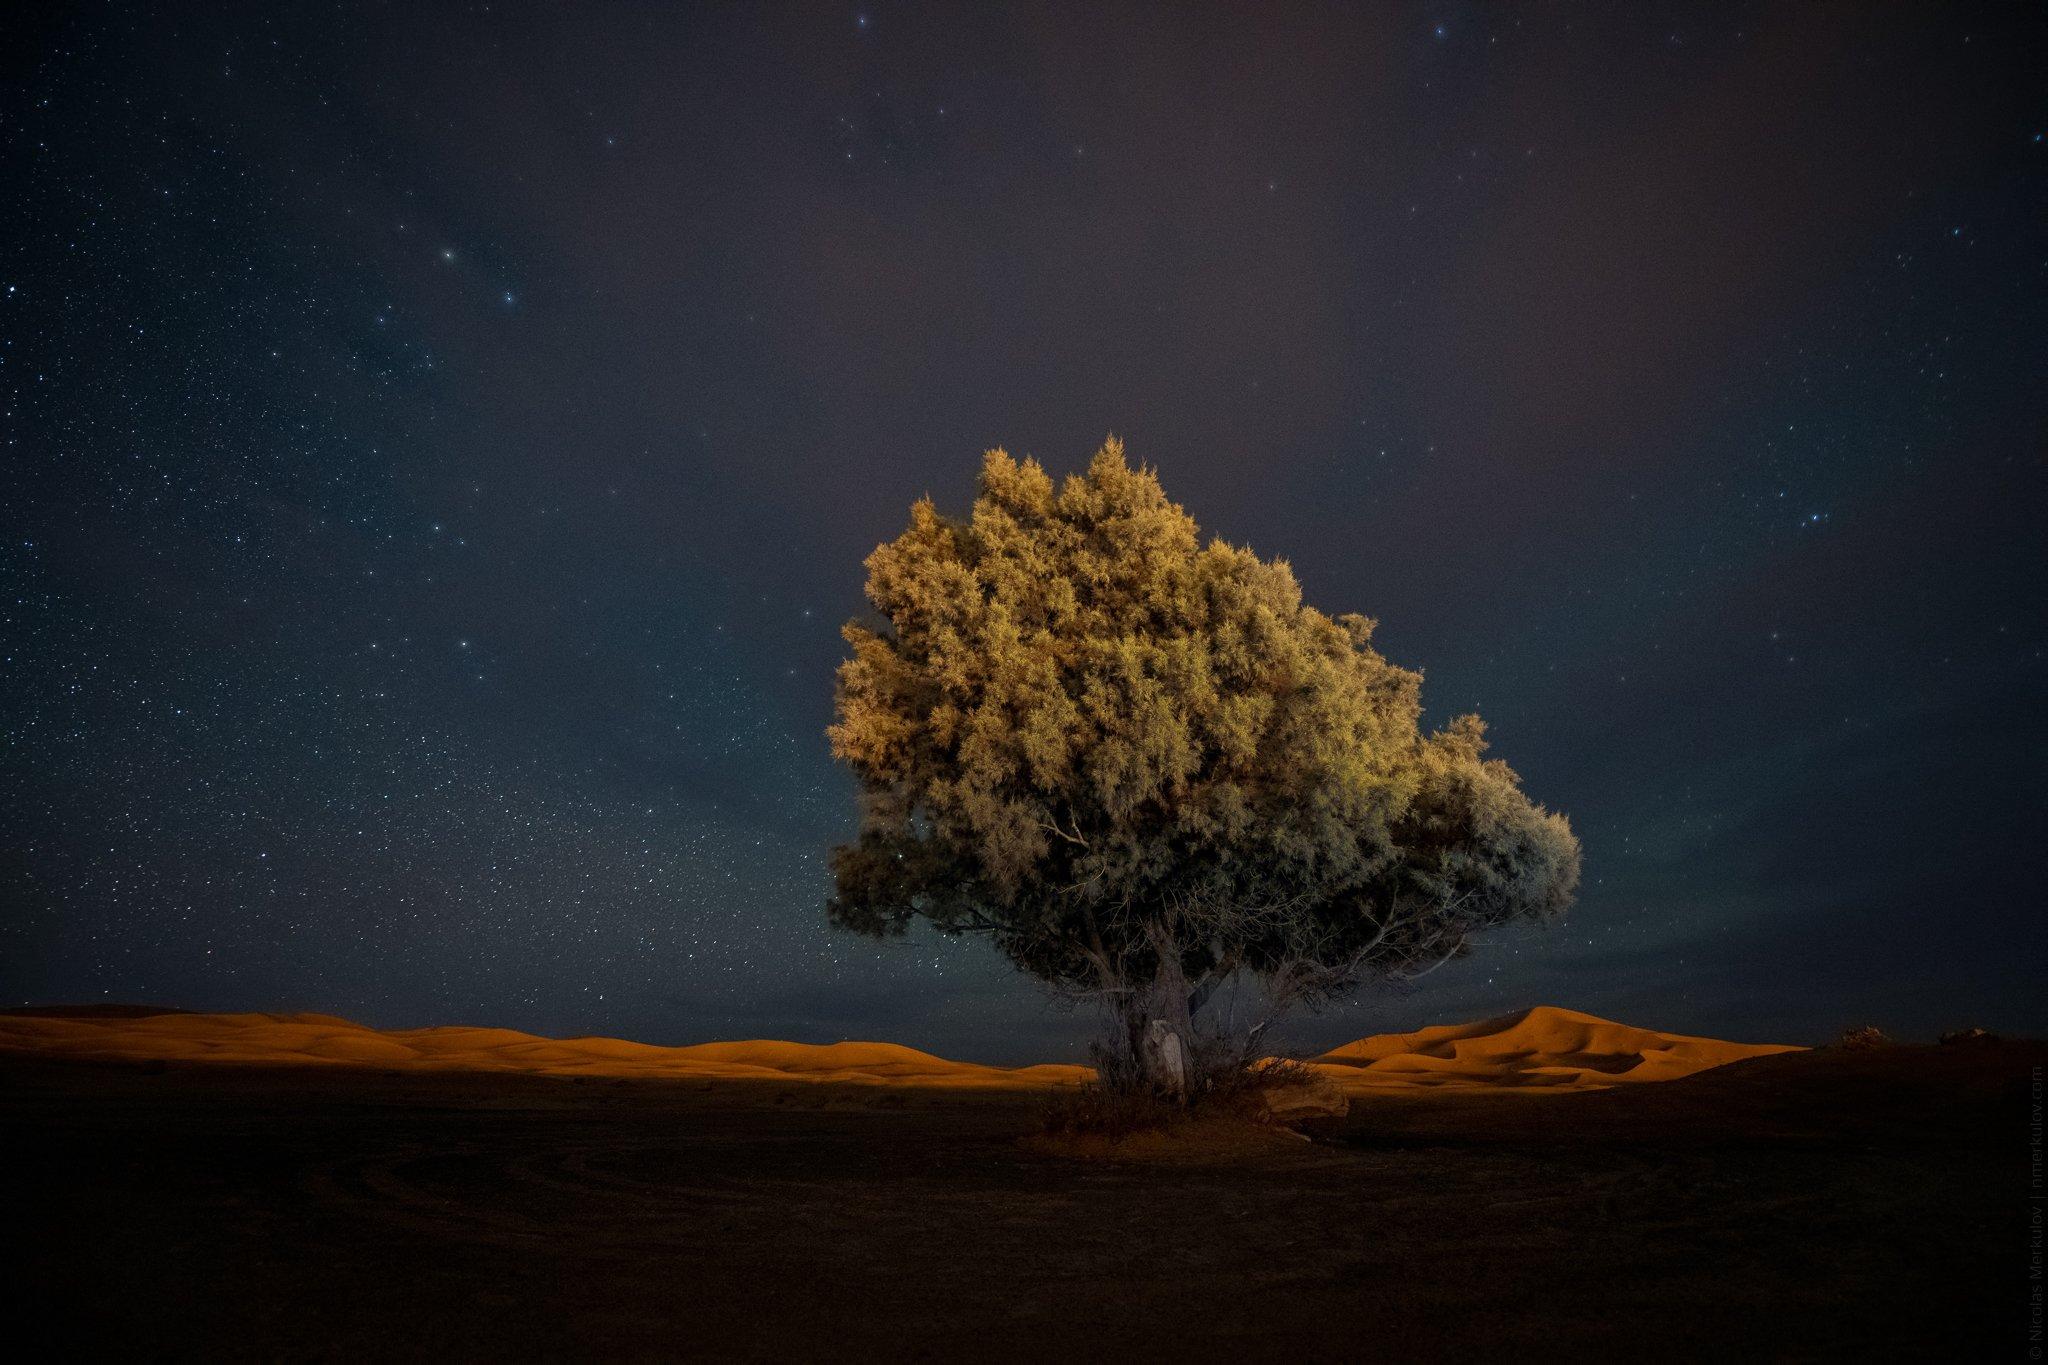 morocco, марокко, africa, африка, sahara, сахара, desert, пустыня, night, ночь, nightscape, landscape, пейзаж, stars, звезды, travel, тревел, Николай Меркулов